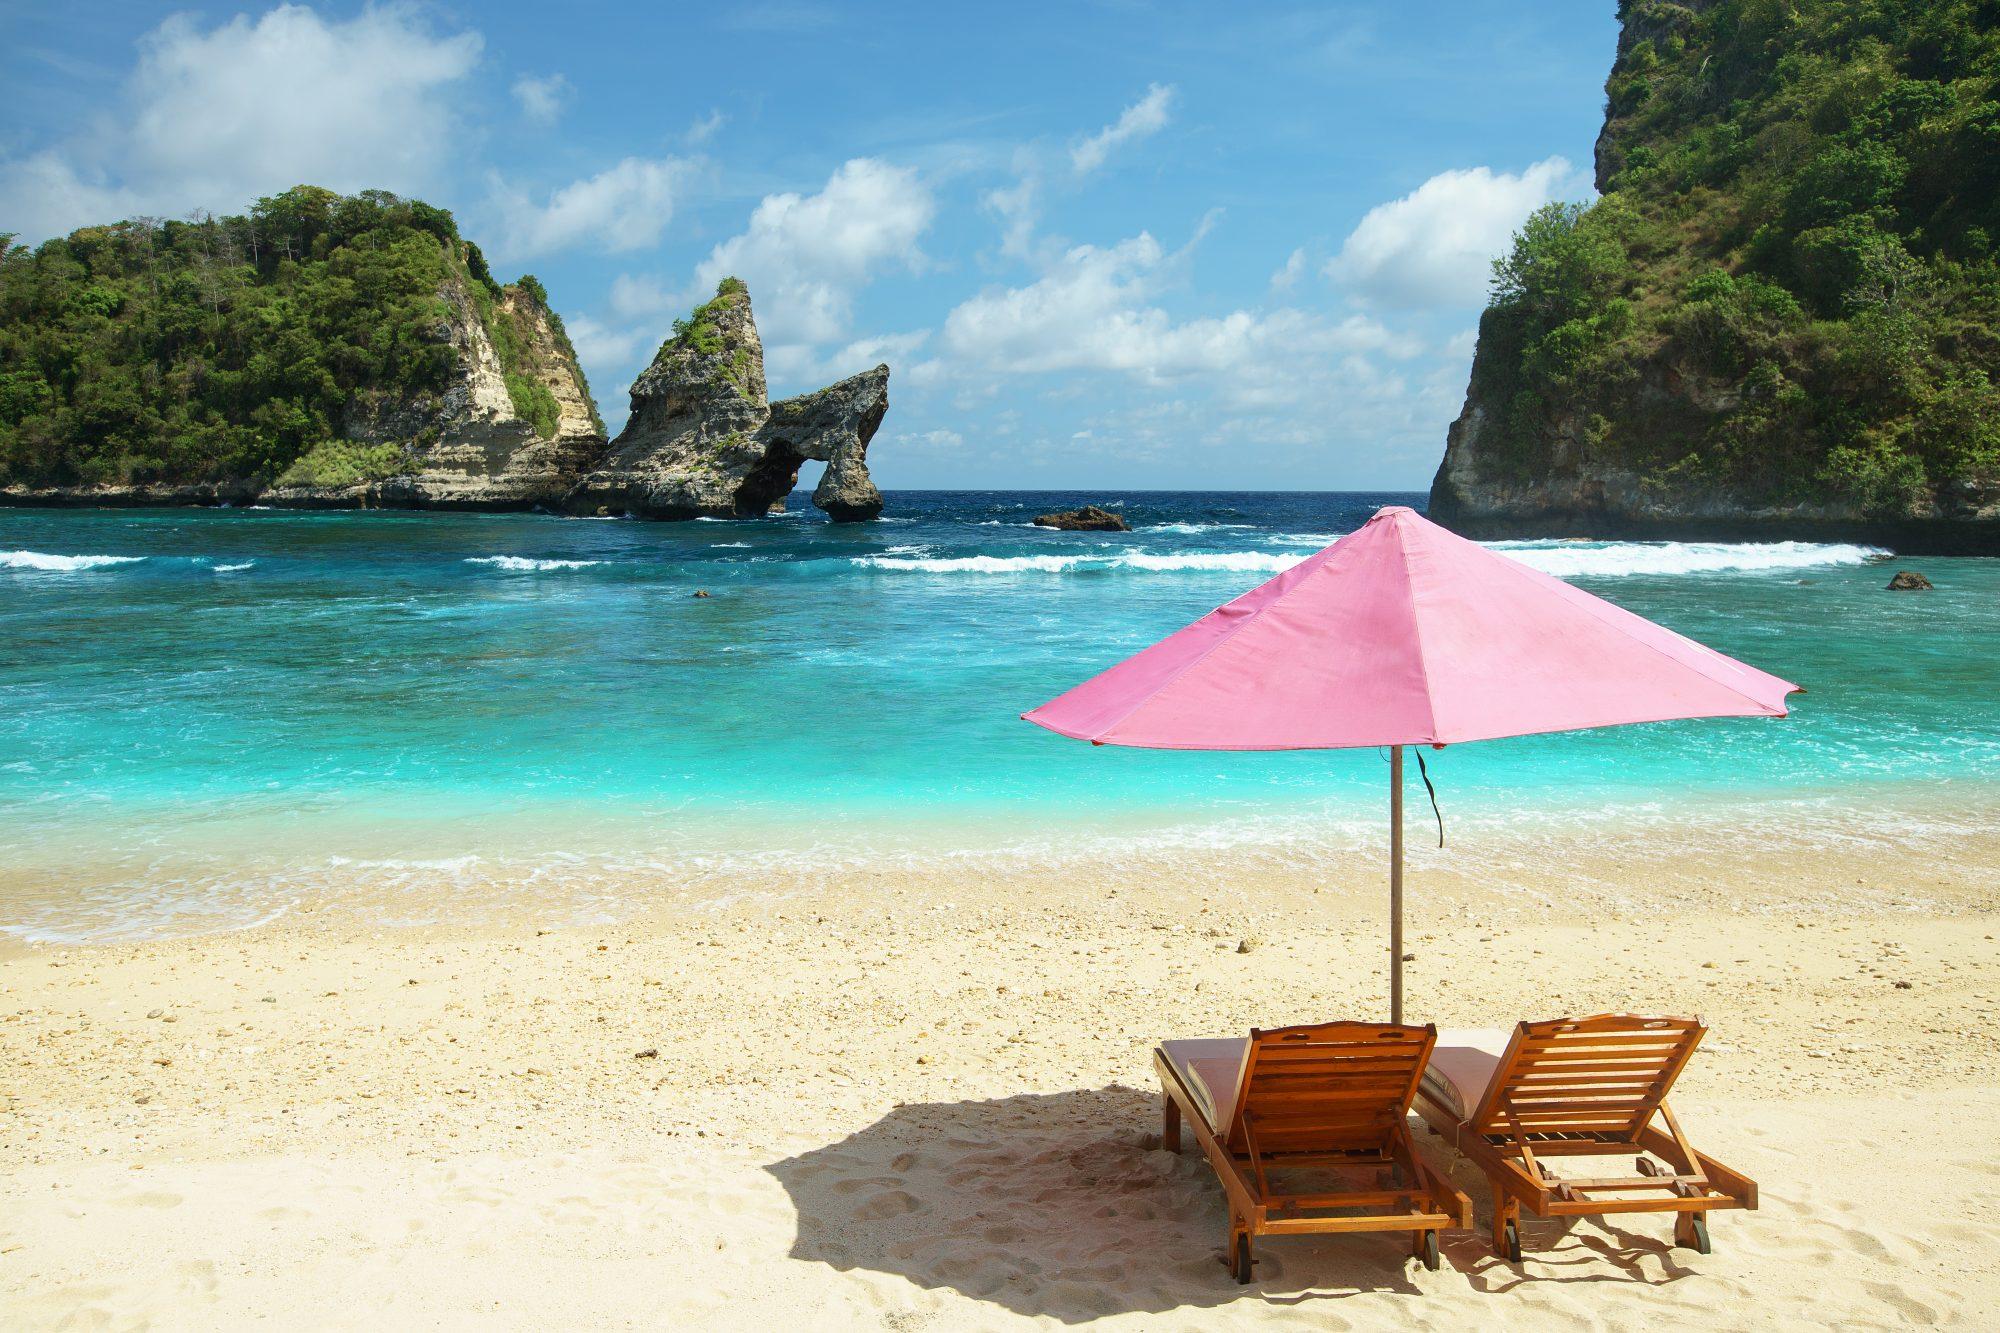 atuh-beach-bali.jpg